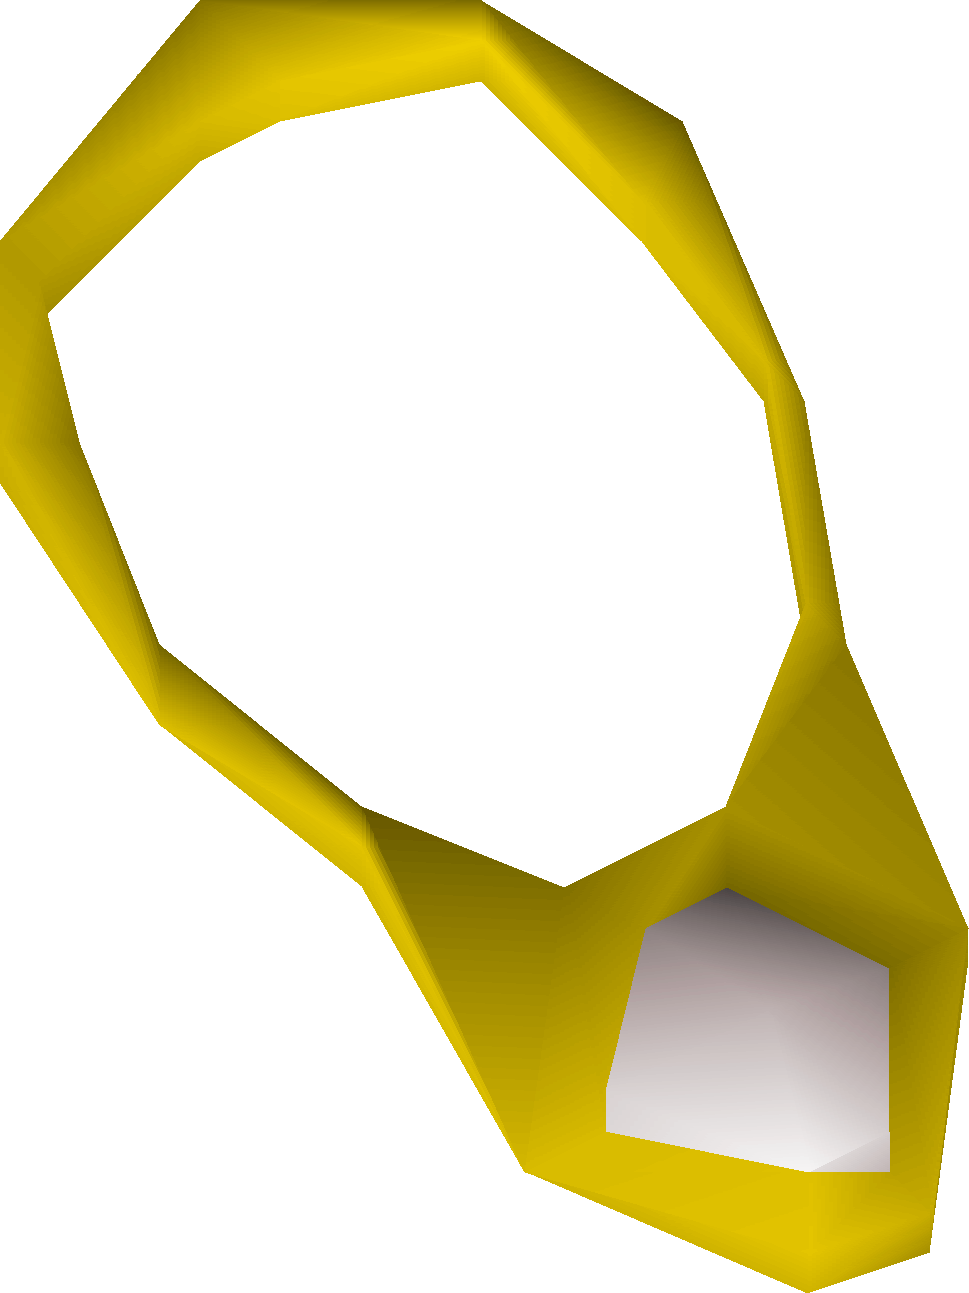 Diamond necklace Old School RuneScape Wiki